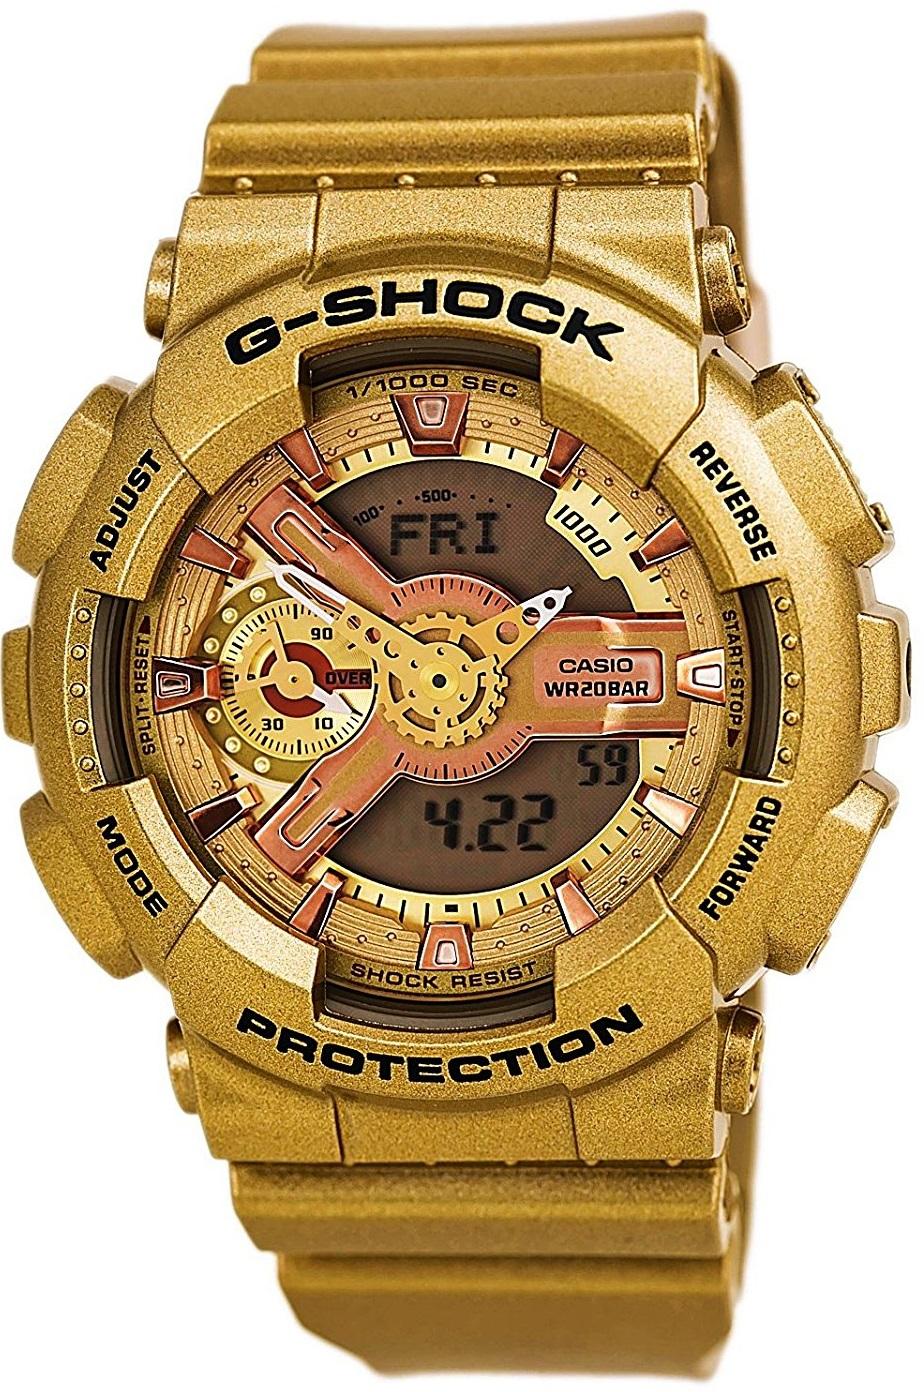 Мужские часы Casio G-Shock GMA-S110VK-9AER